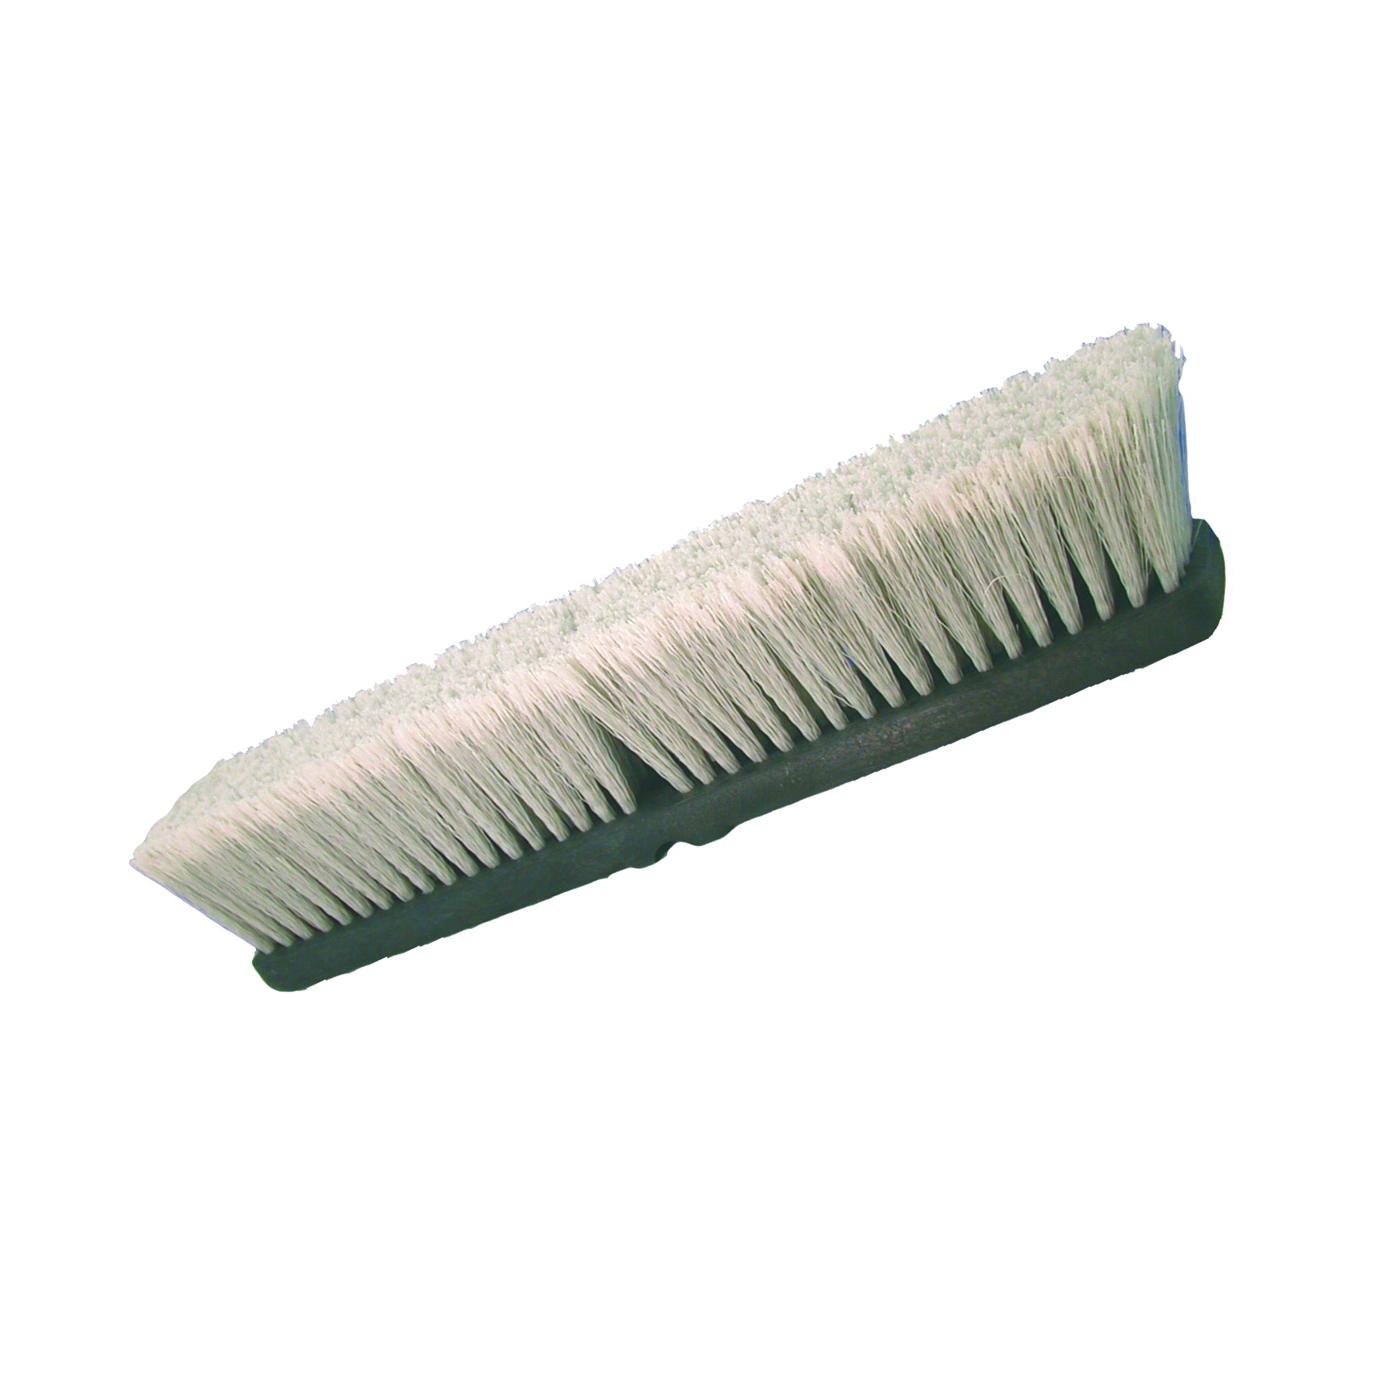 Picture of BIRDWELL 2019-12 Broom Head Threaded, Threaded, 3 in L Trim, Polypropylene/Polystyrene Bristle, Gray